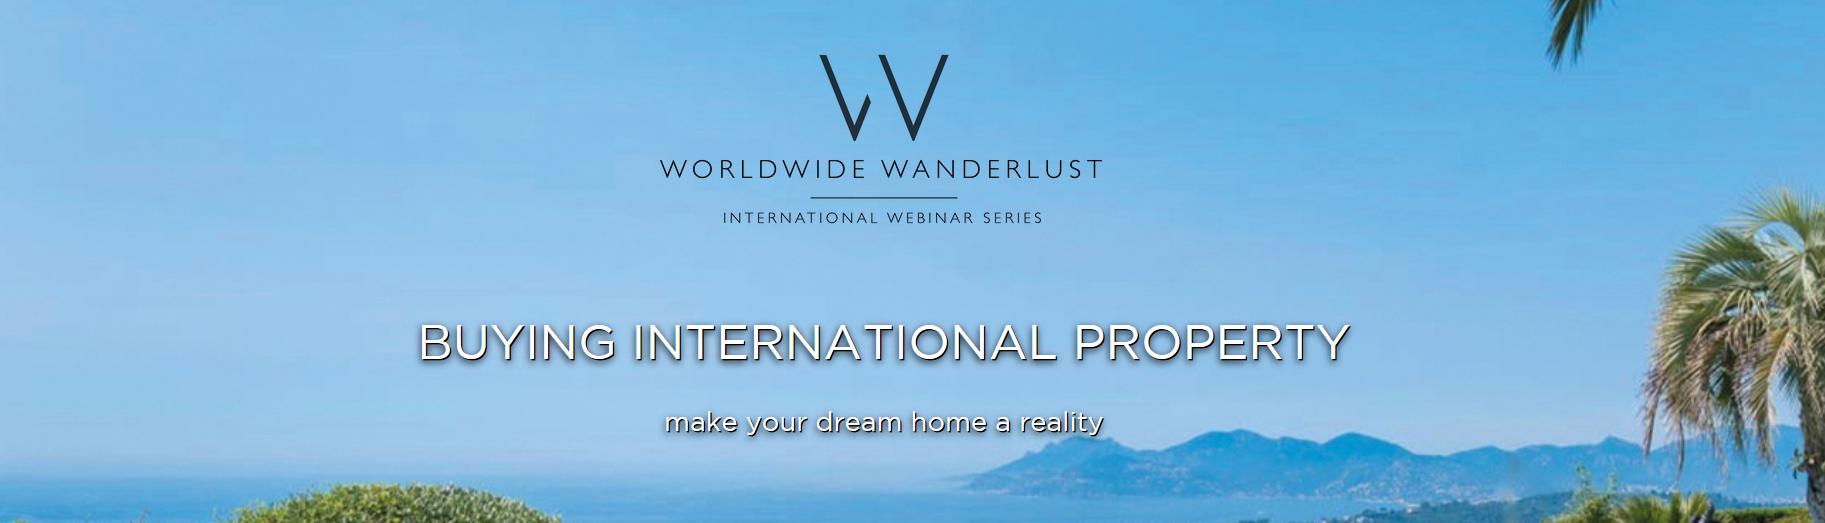 International Webinar Series: Focus on Cannes